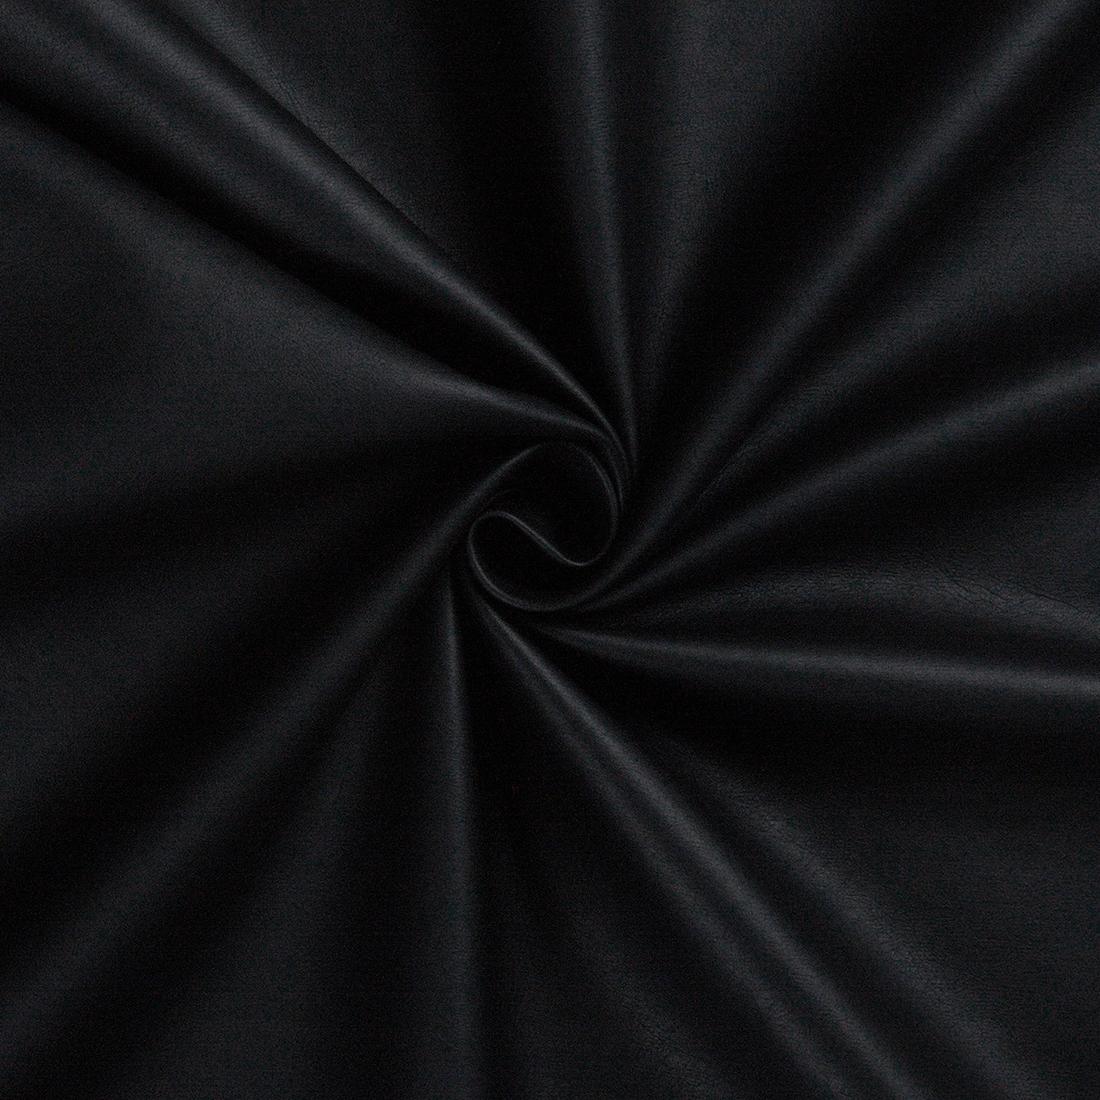 Leatherlook Black Dress Fabric